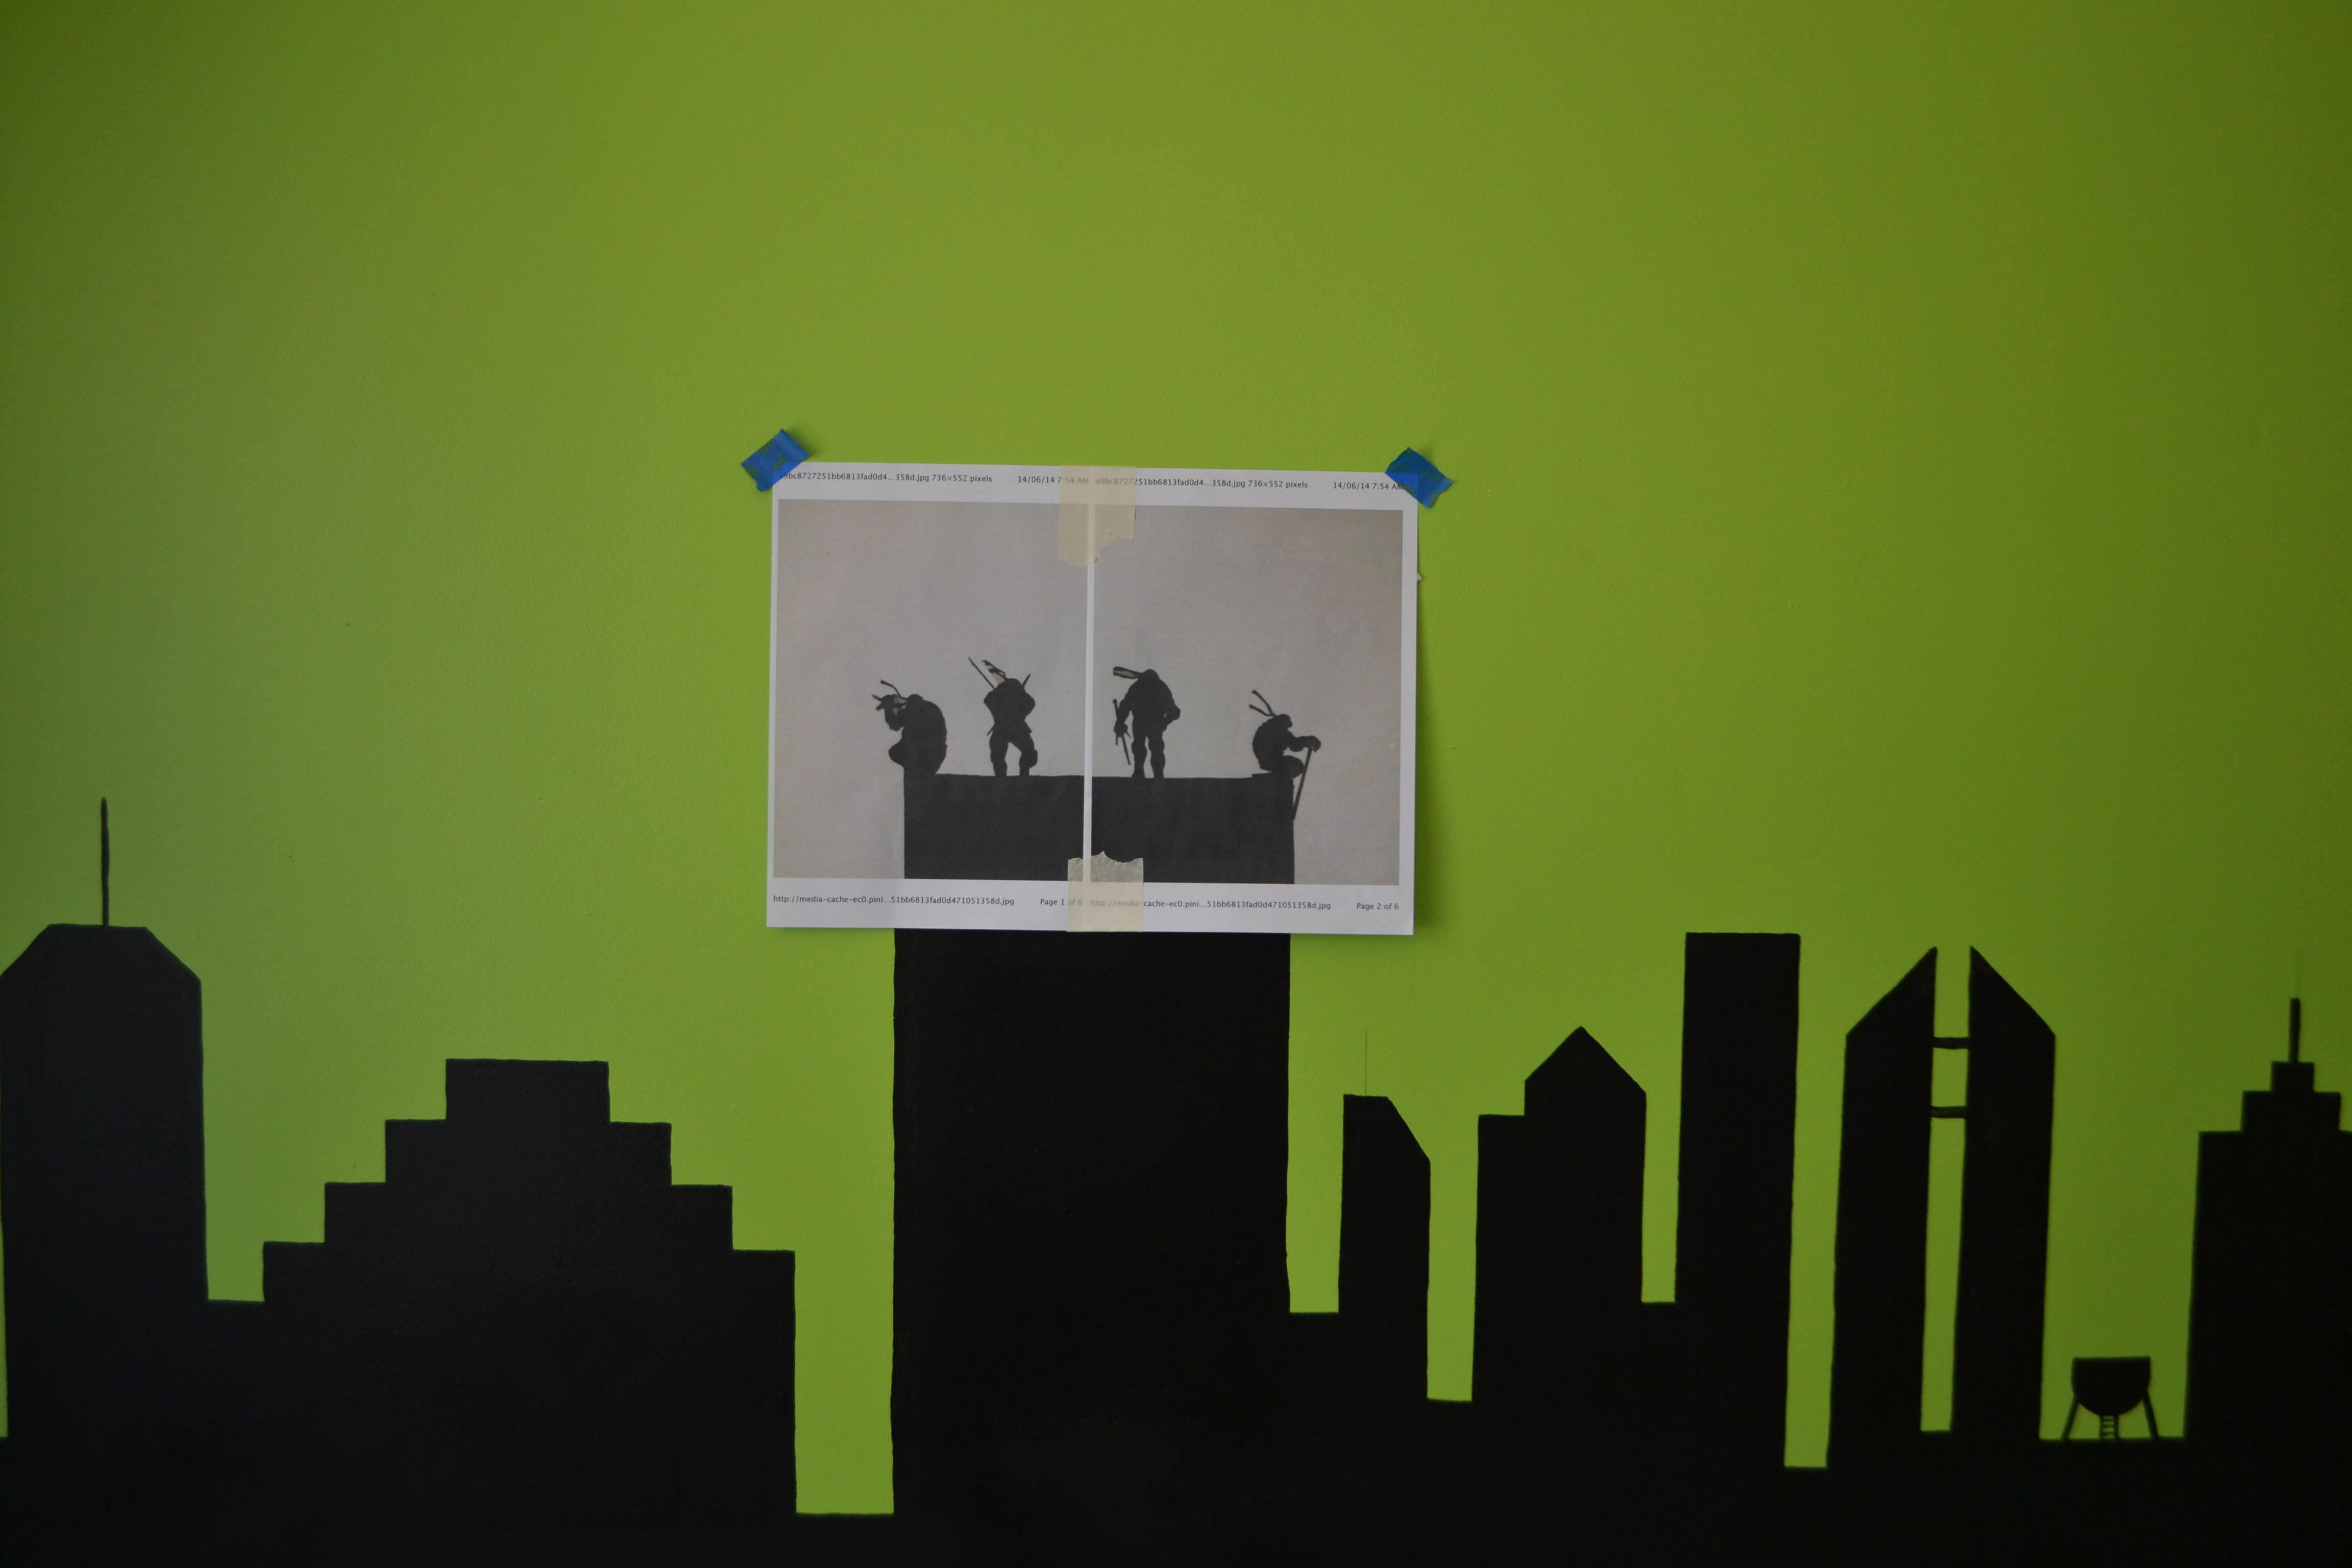 Teenage Mutant Ninja Turtle wall mural – the beach bomb